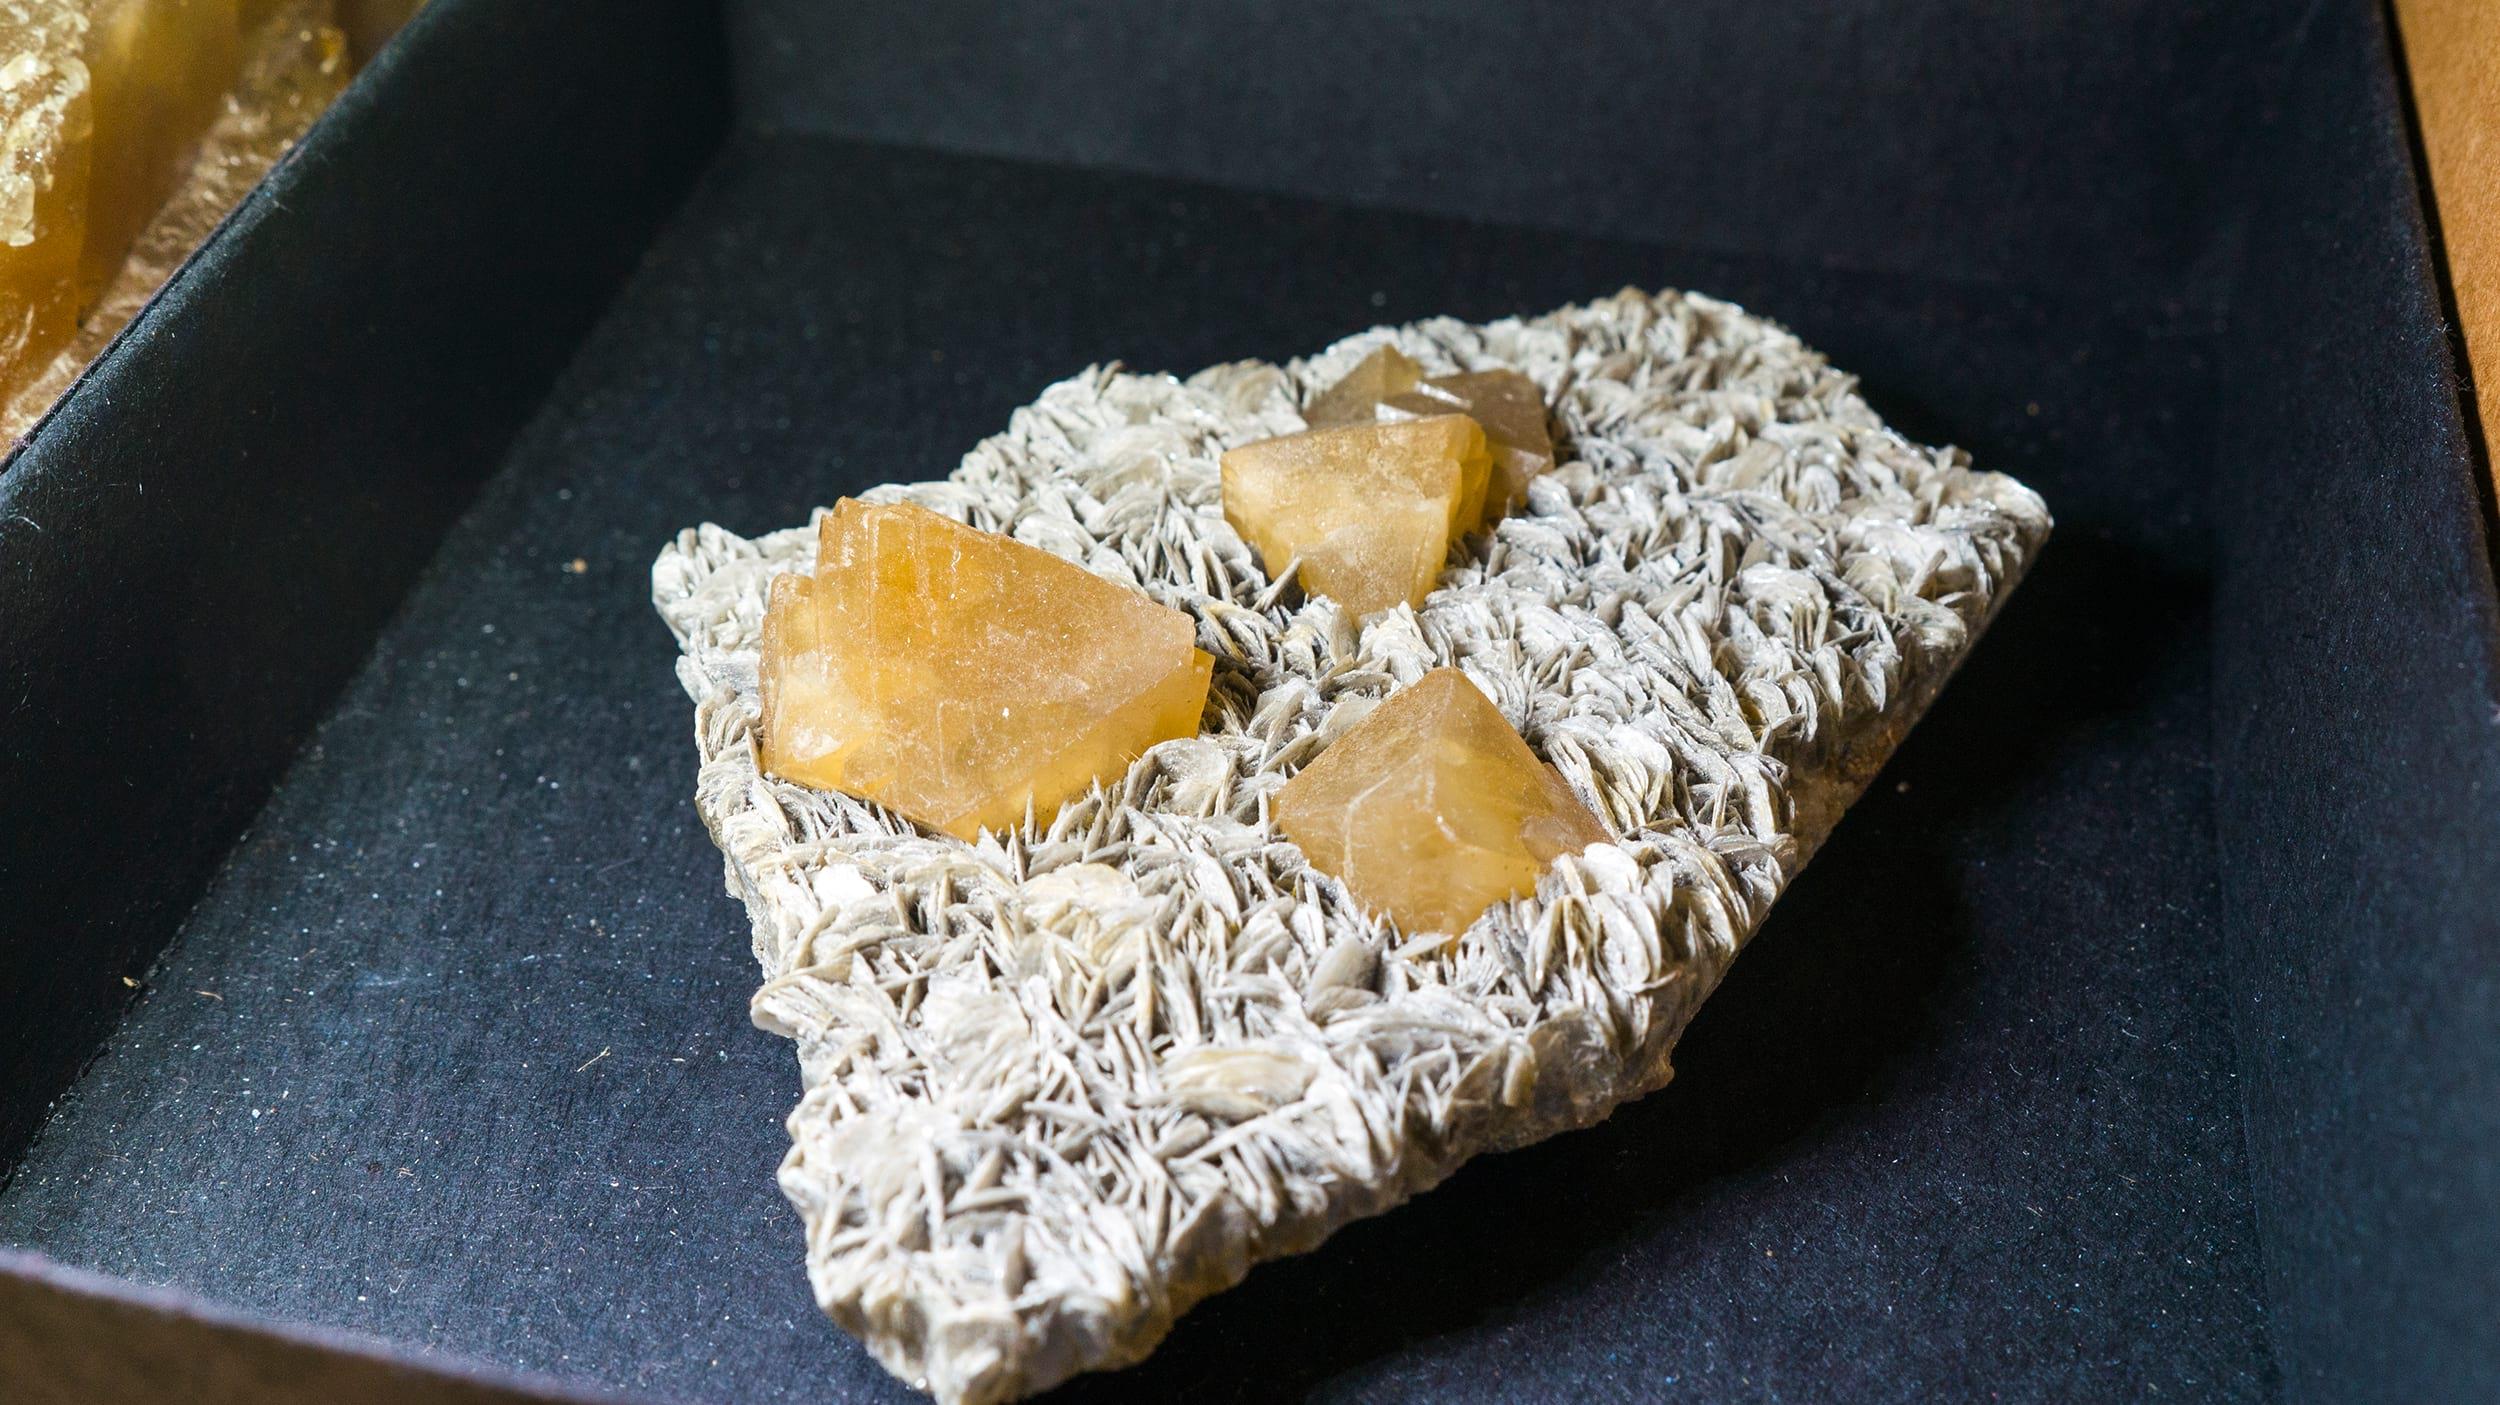 Wonderful well terminated scheelite on muscovite from China